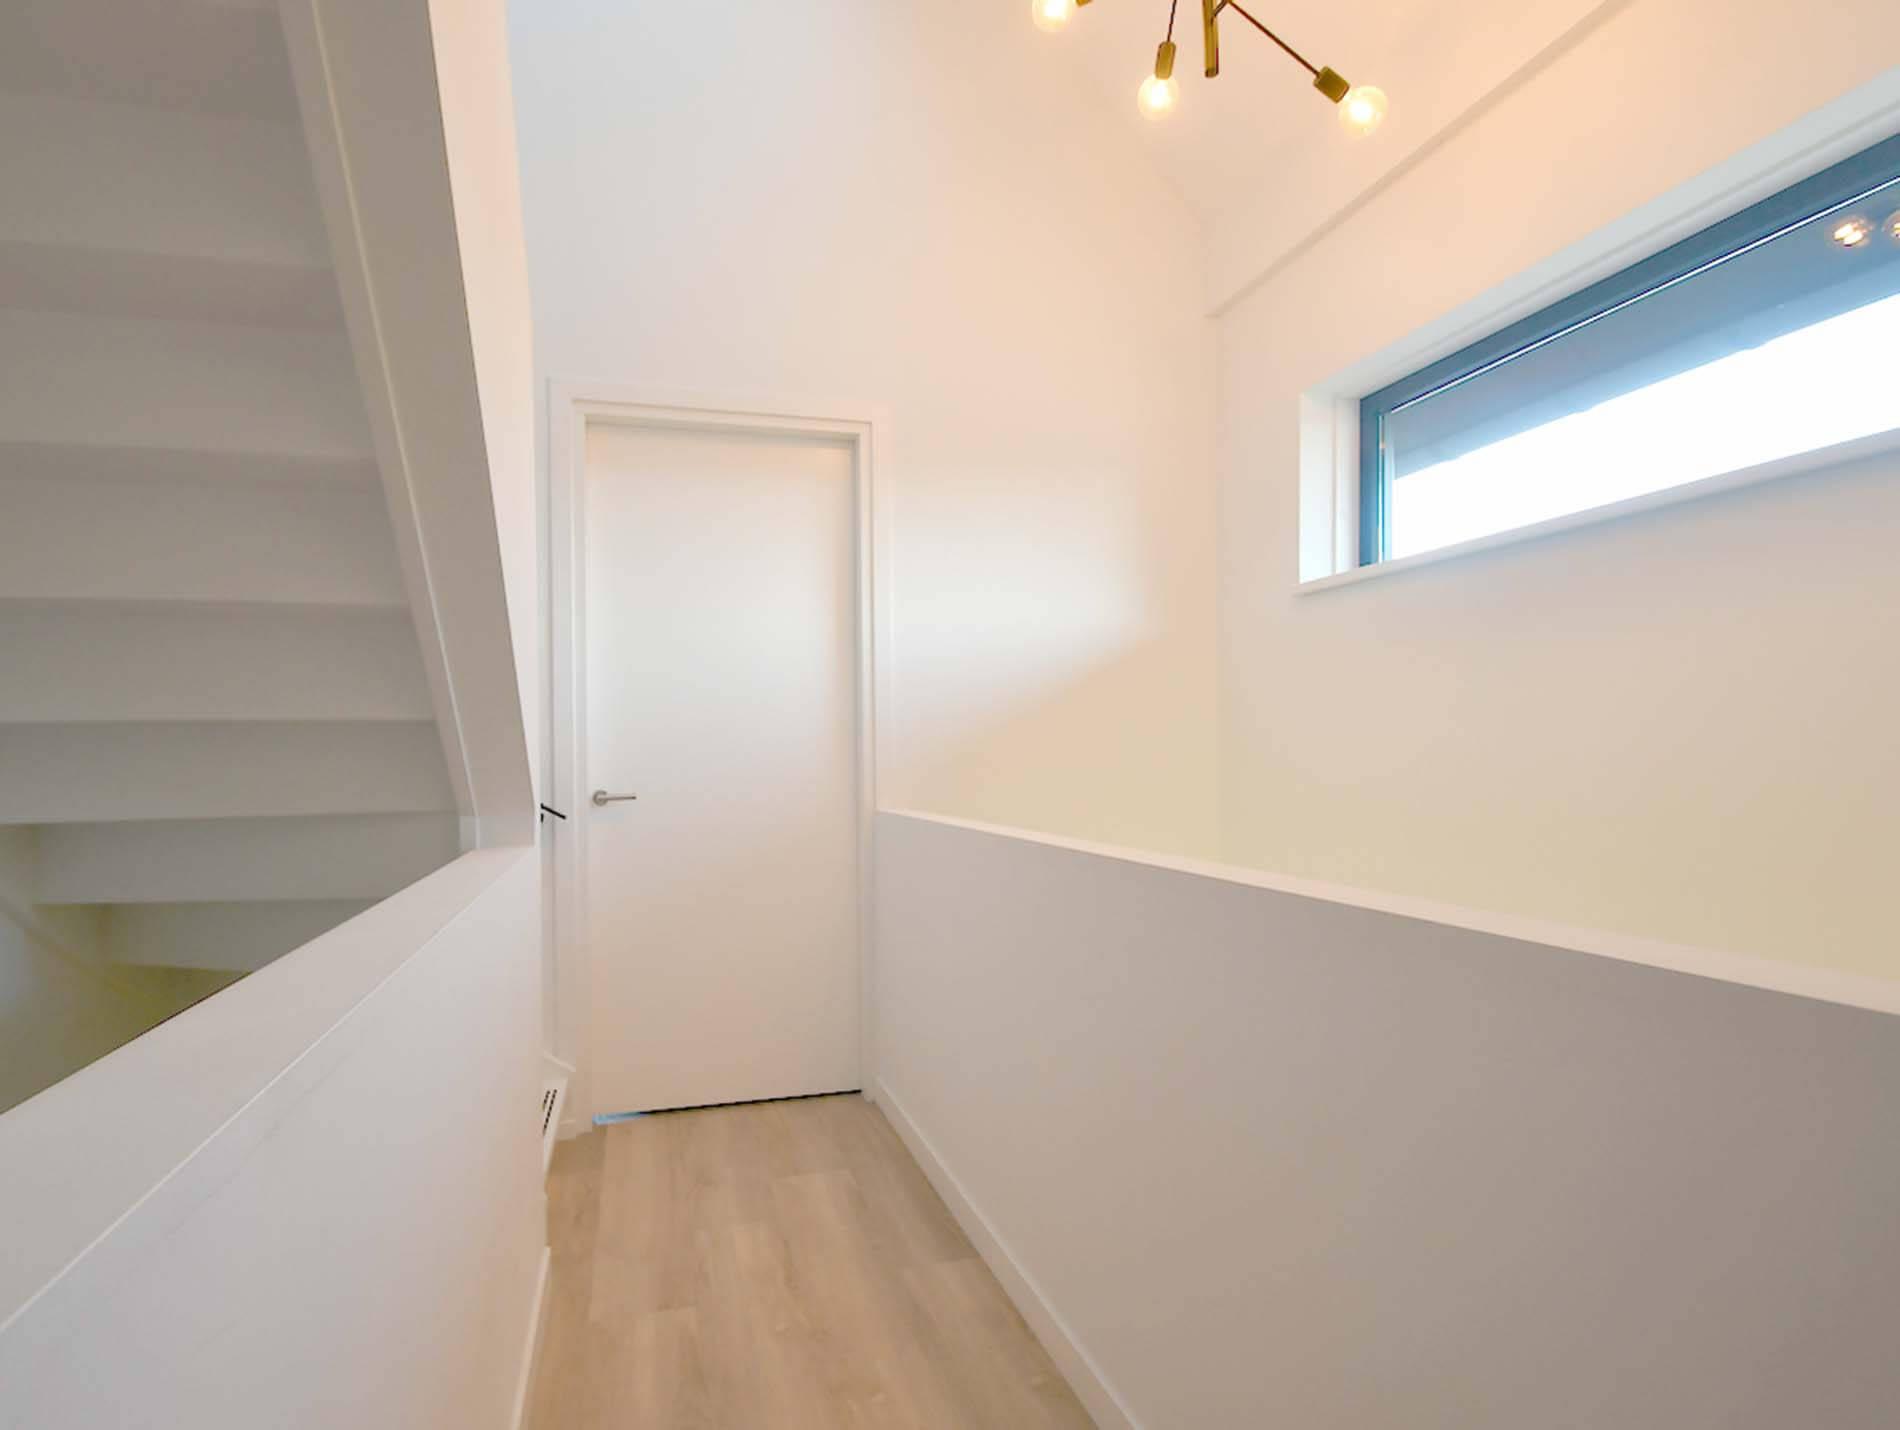 9. Drachten-nieuwbouw-woning-1900x1430p.jpg